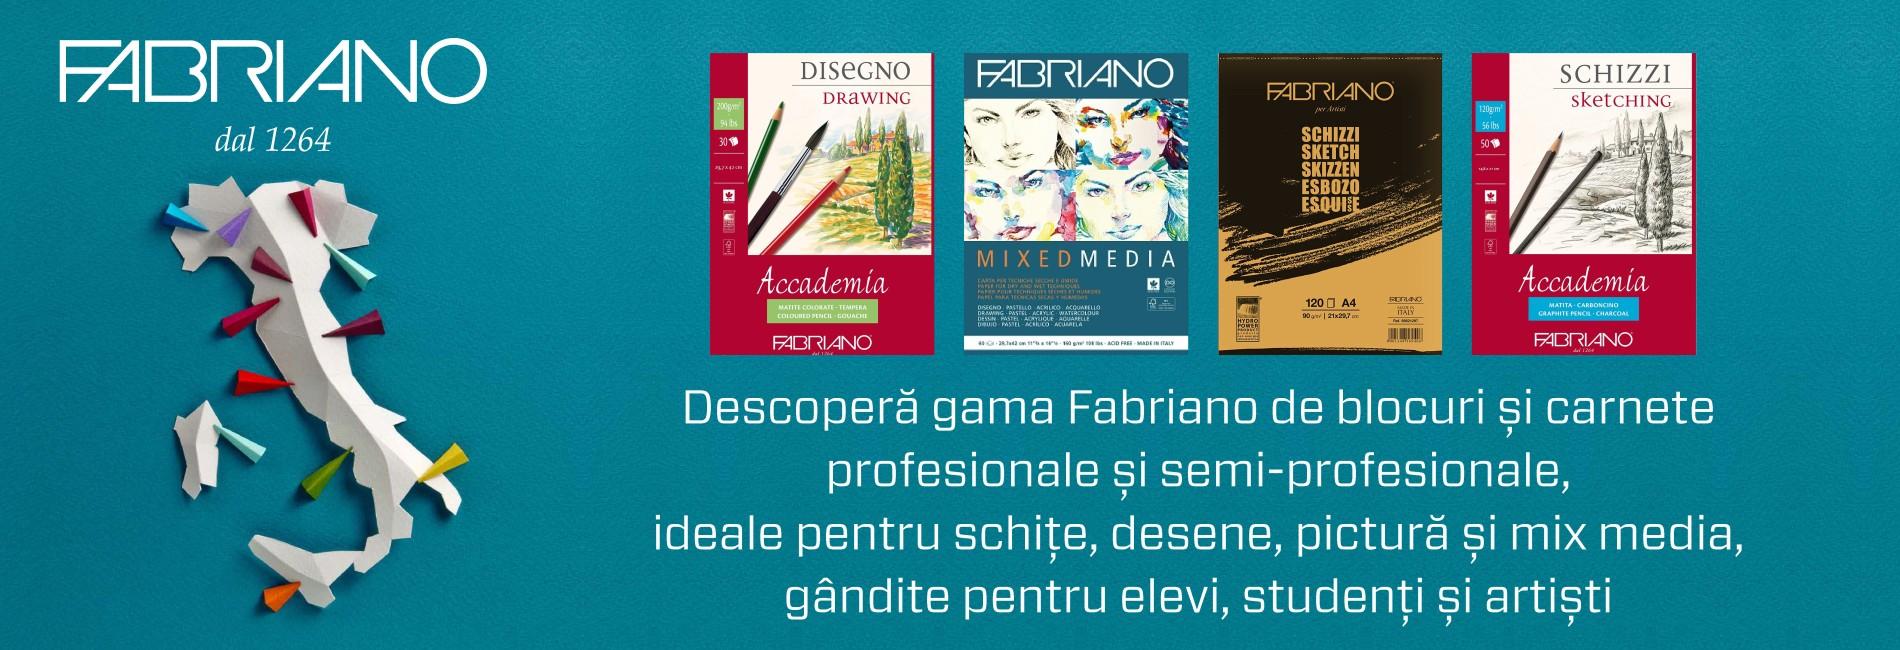 Gama Fabriano